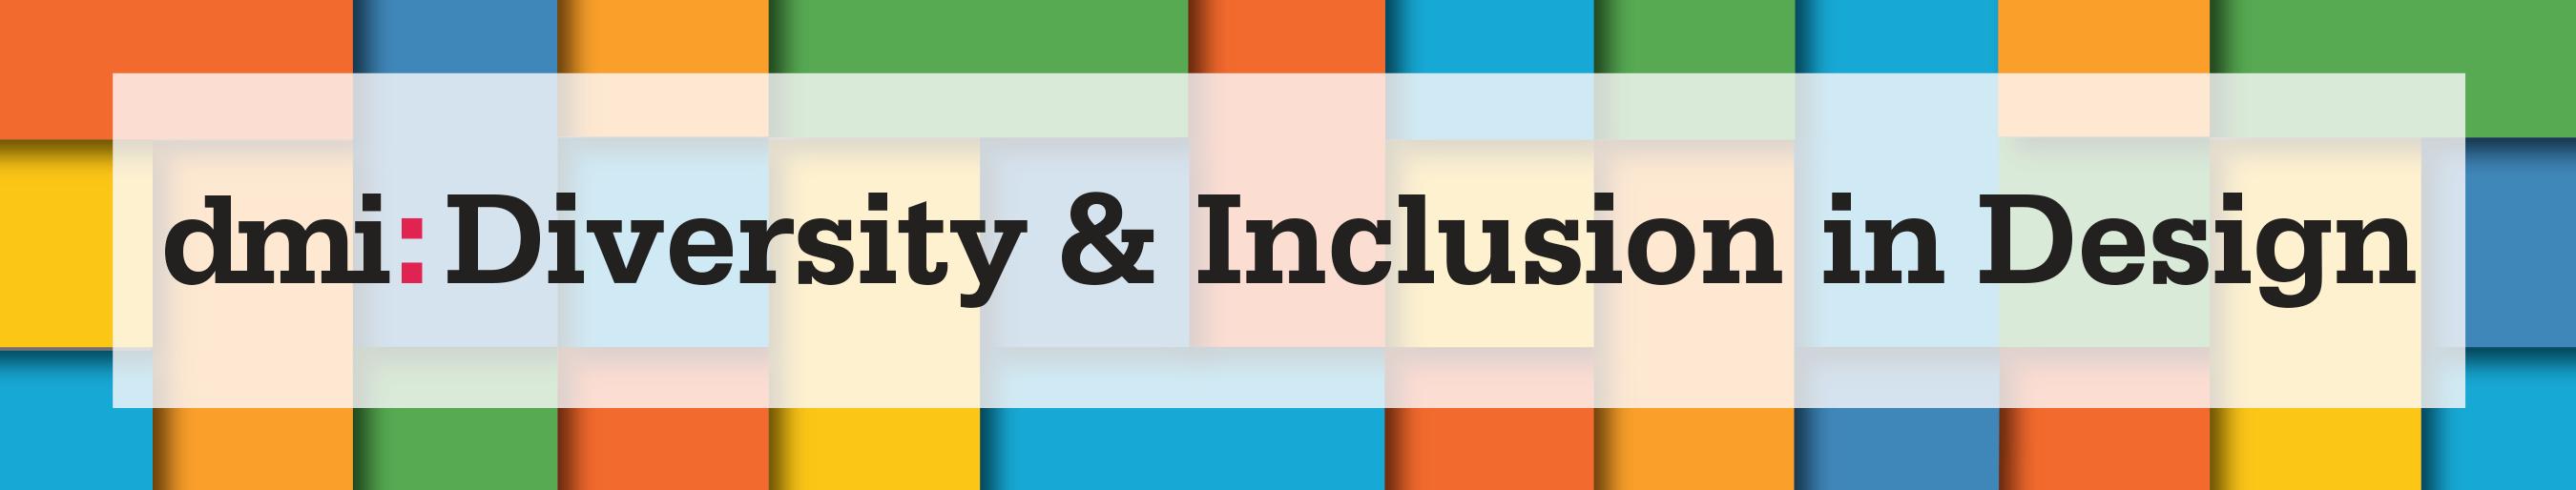 dmi:Diversity & Inclusion in Design